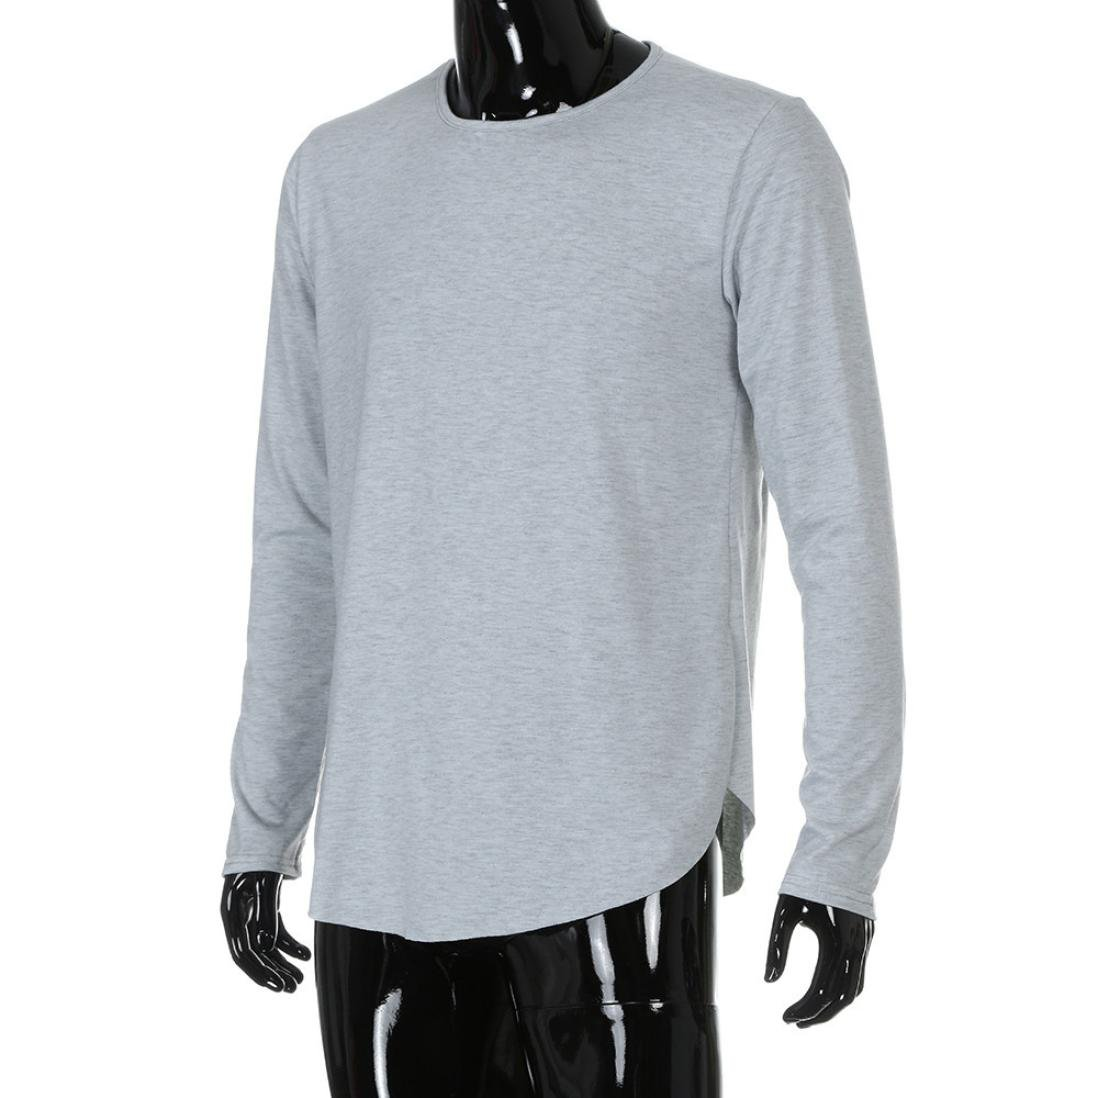 8c1238cbcb63 haoricu Mens Shirt, 2017 Men O Neck Long Sleeve Slim Fit Tee T-Shirt Casual  Tops at Amazon Men's Clothing store: